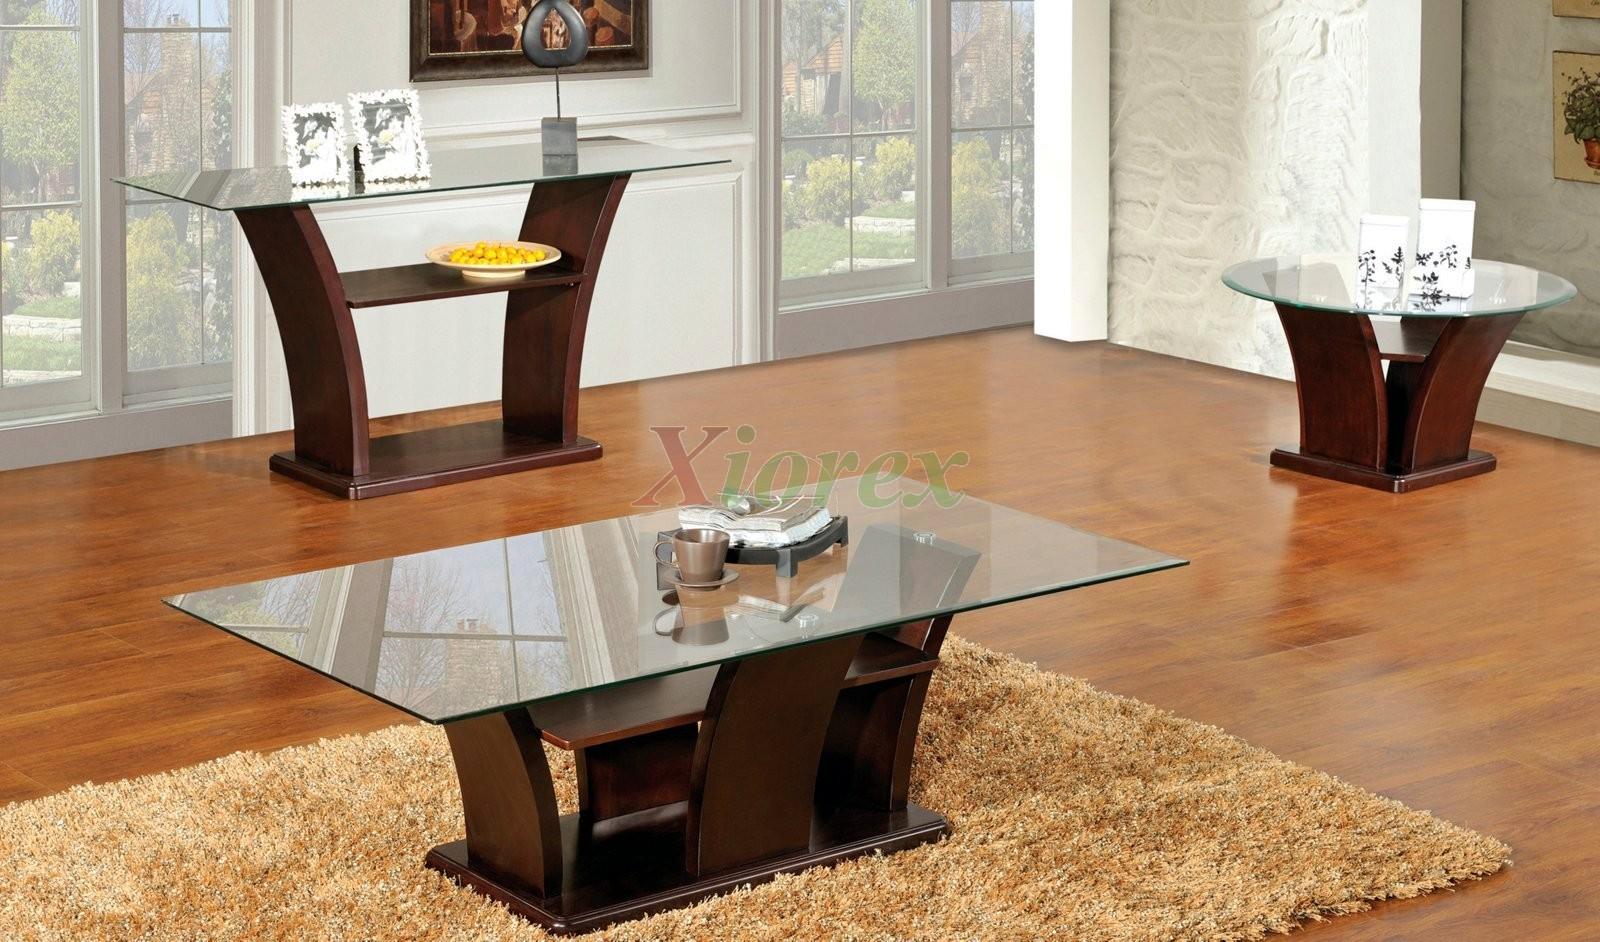 Coffee table sets columba 3-piece coffee table set with sofa console table |  xiorex LPPGQFI